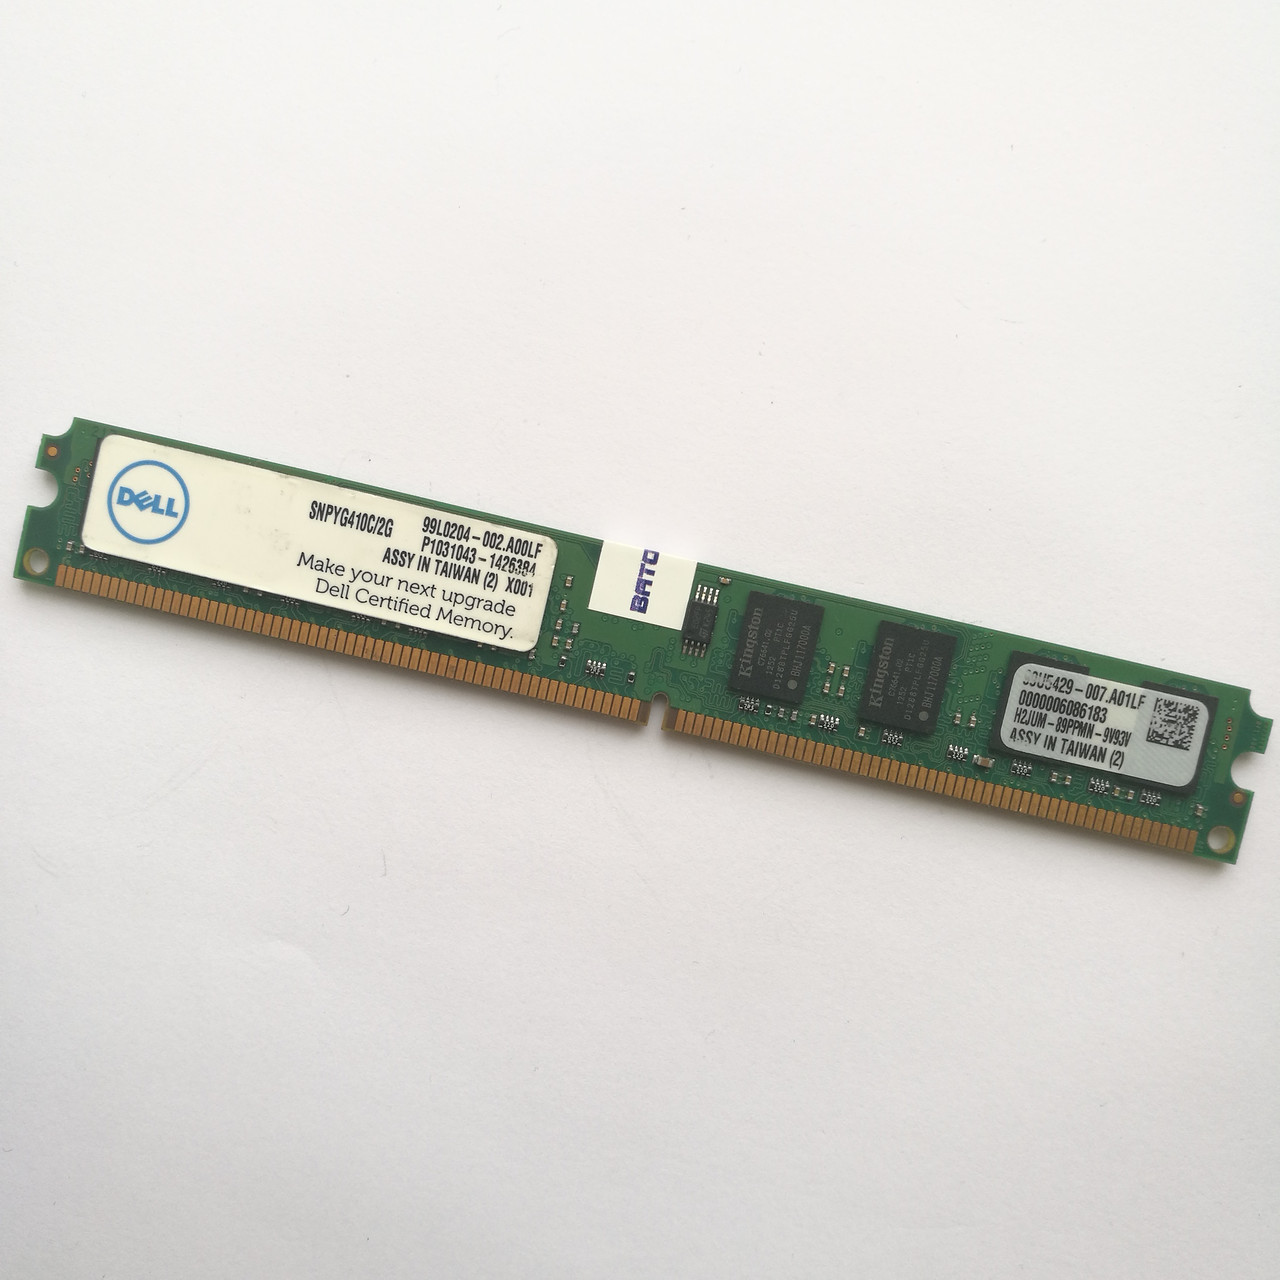 Оперативная память Kingston DDR2 2Gb 800MHz PC2 6400U LP CL6 (99U5429-007.A01LF) Б/У